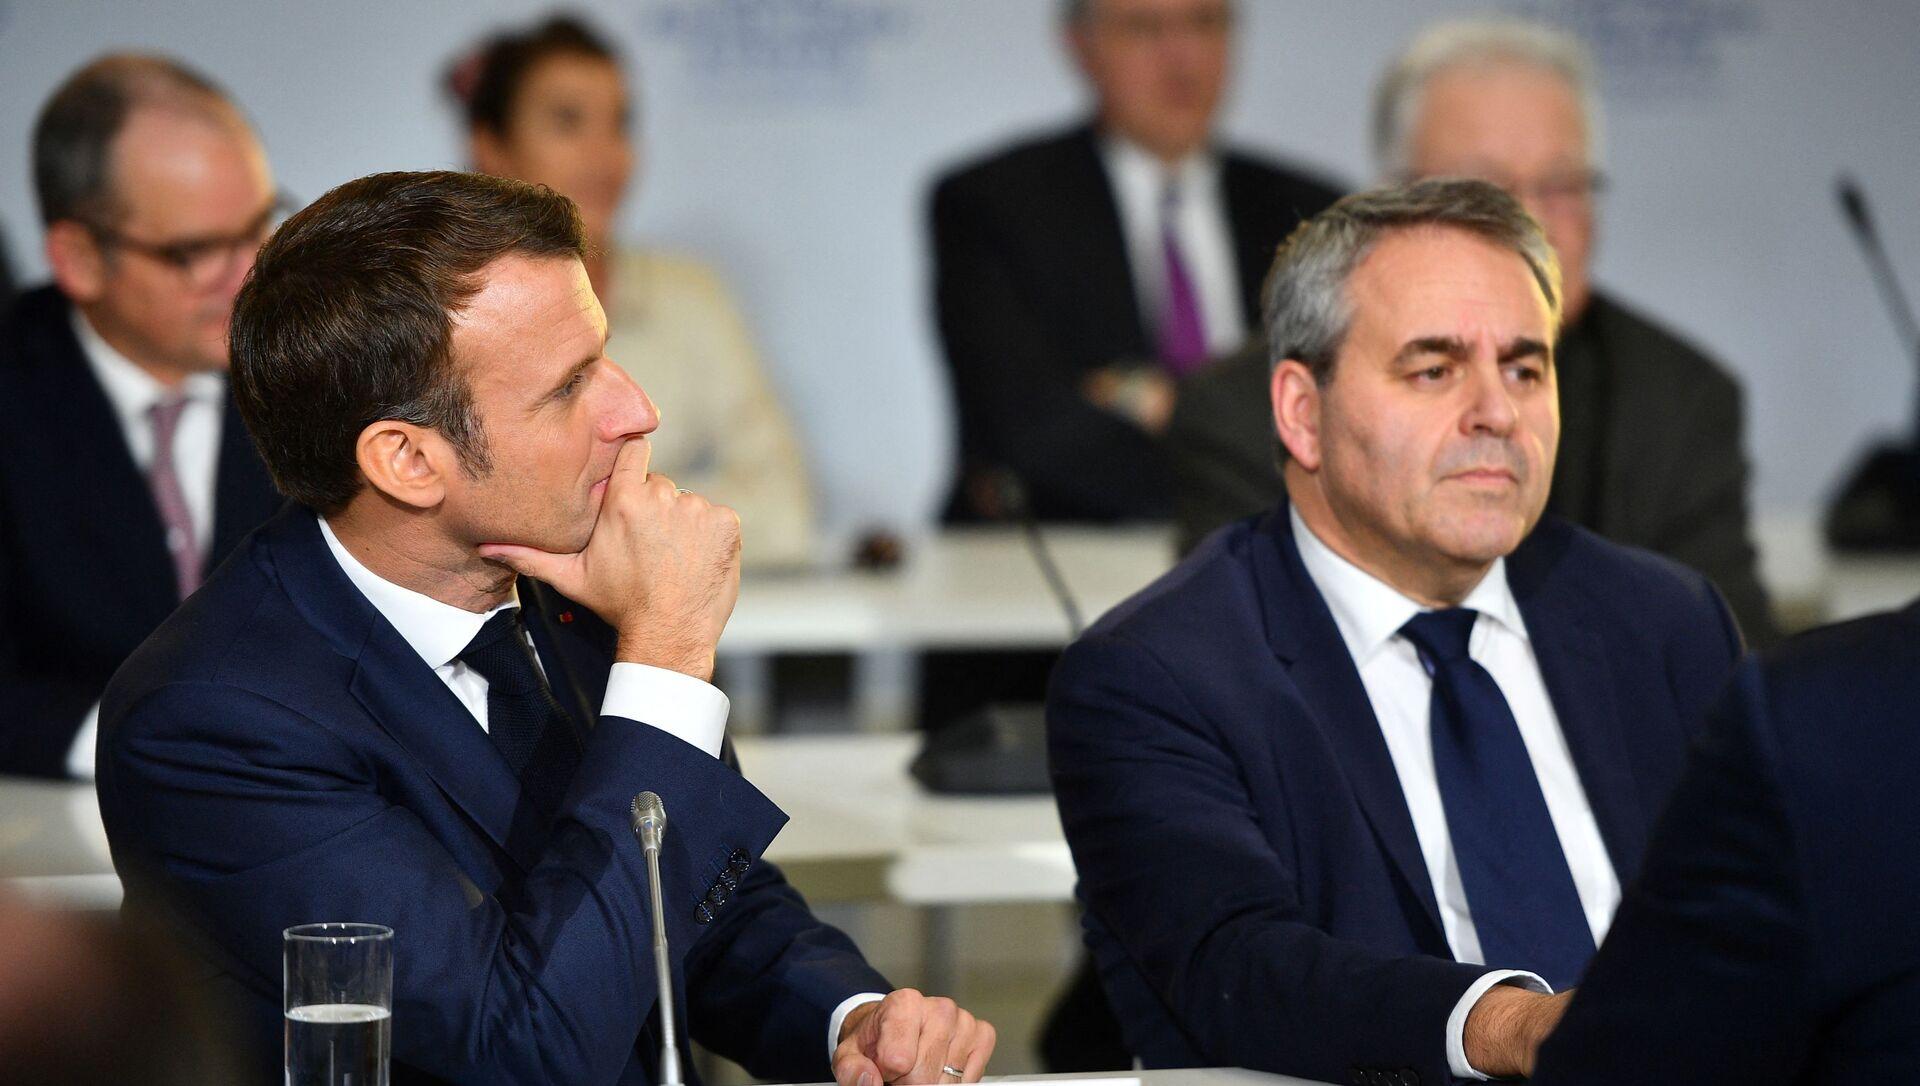 Emmanuel Macron et Xavier Bertrand - Sputnik France, 1920, 22.08.2021